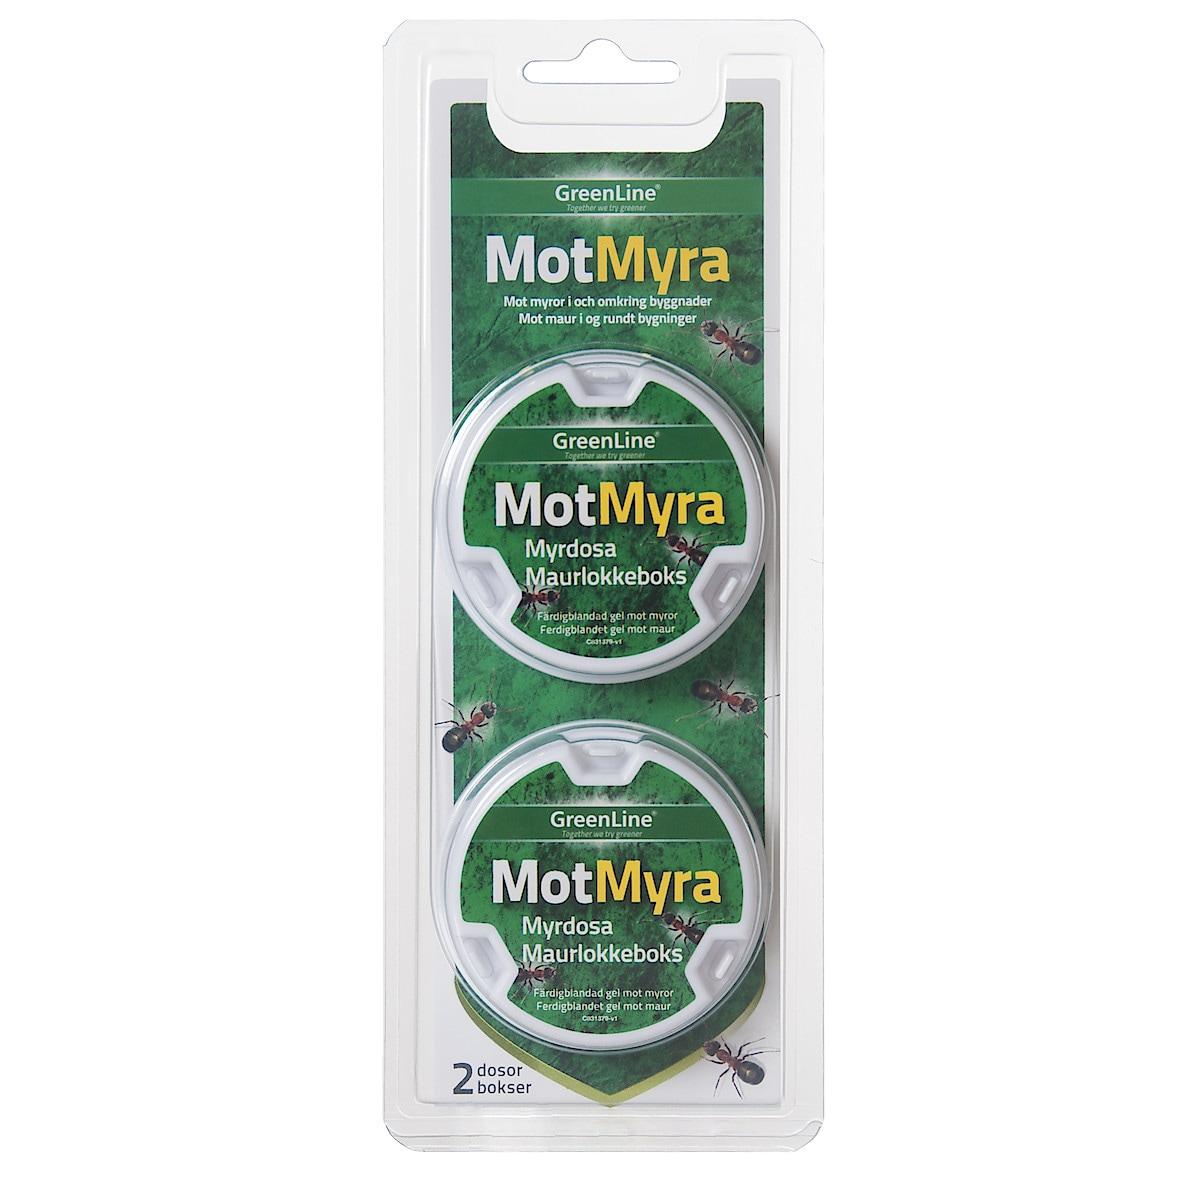 MotMyra, maurboks